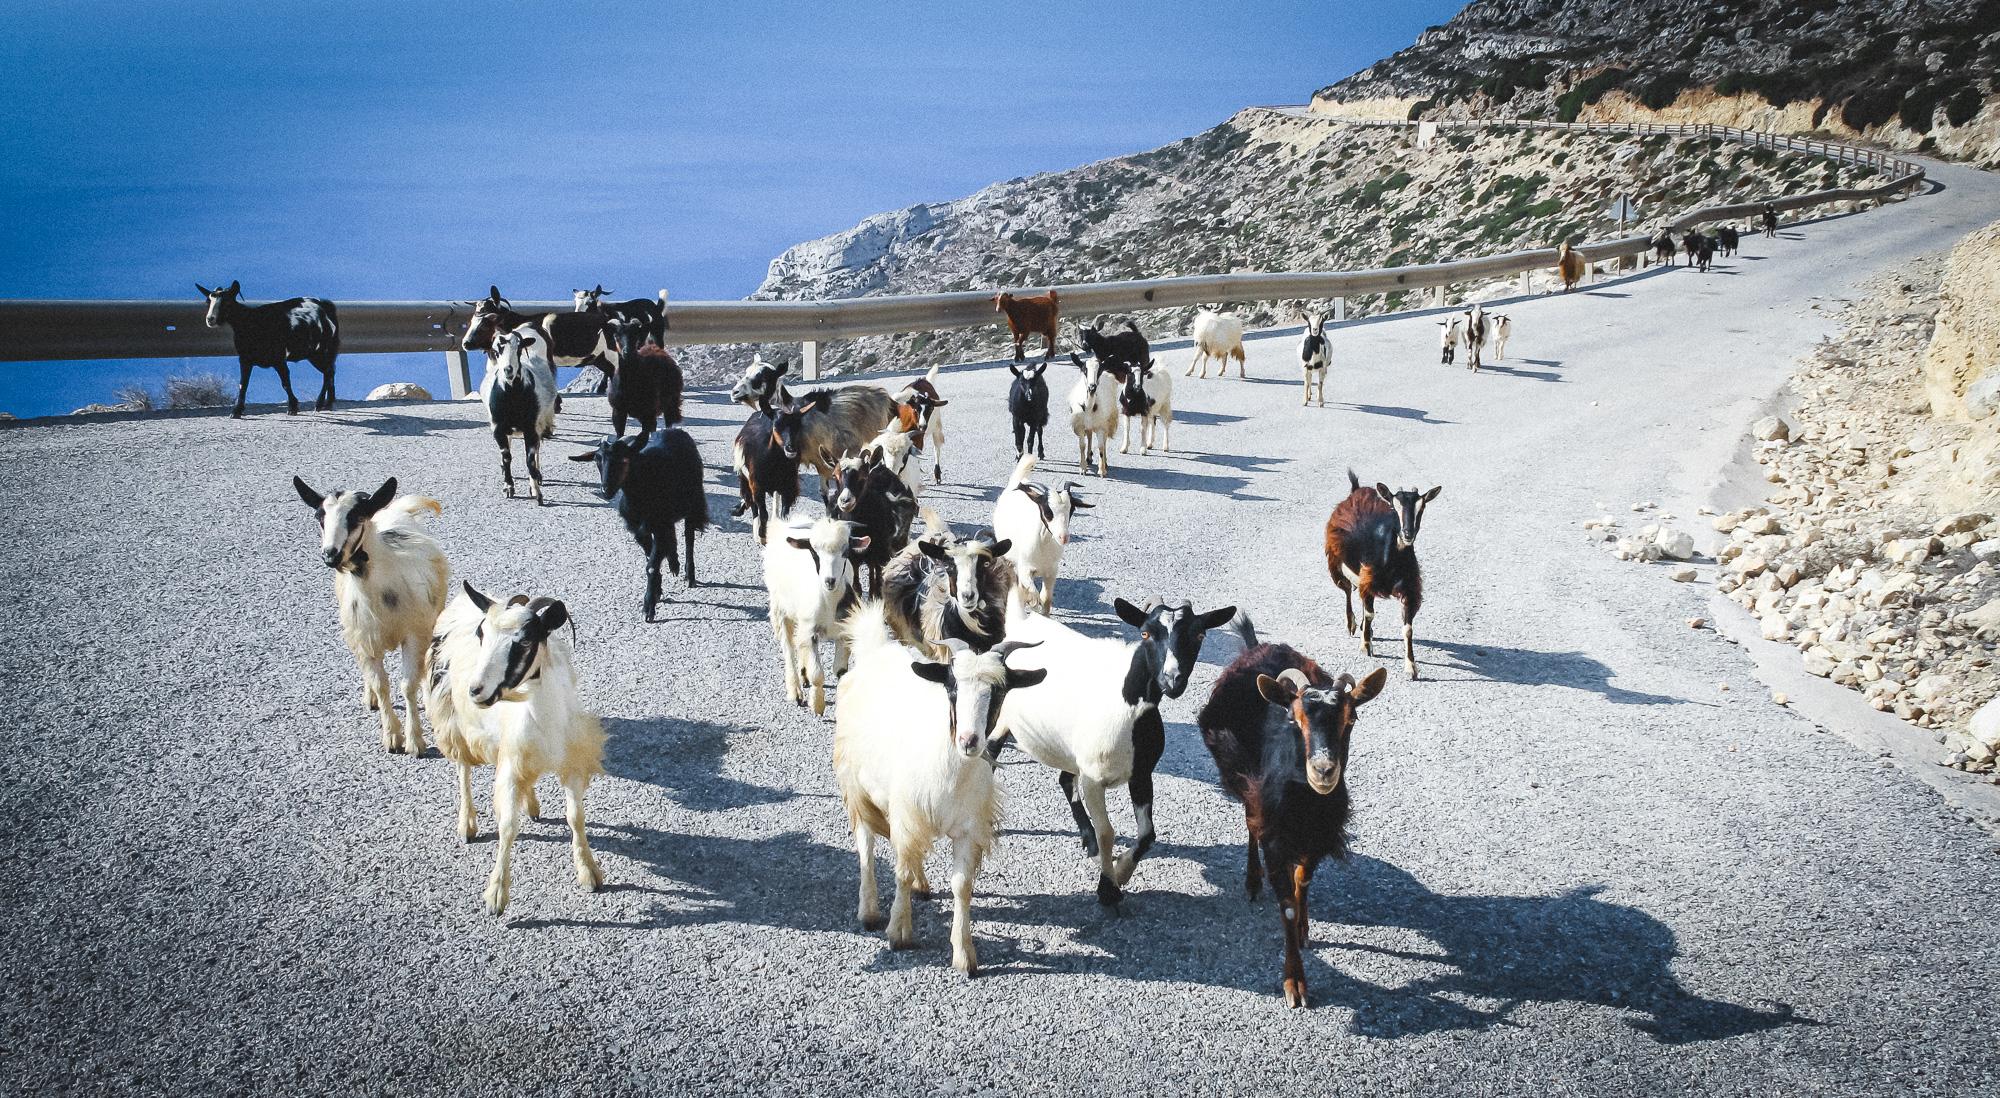 greek-shepherds-15-stemajourneys.com.jpg